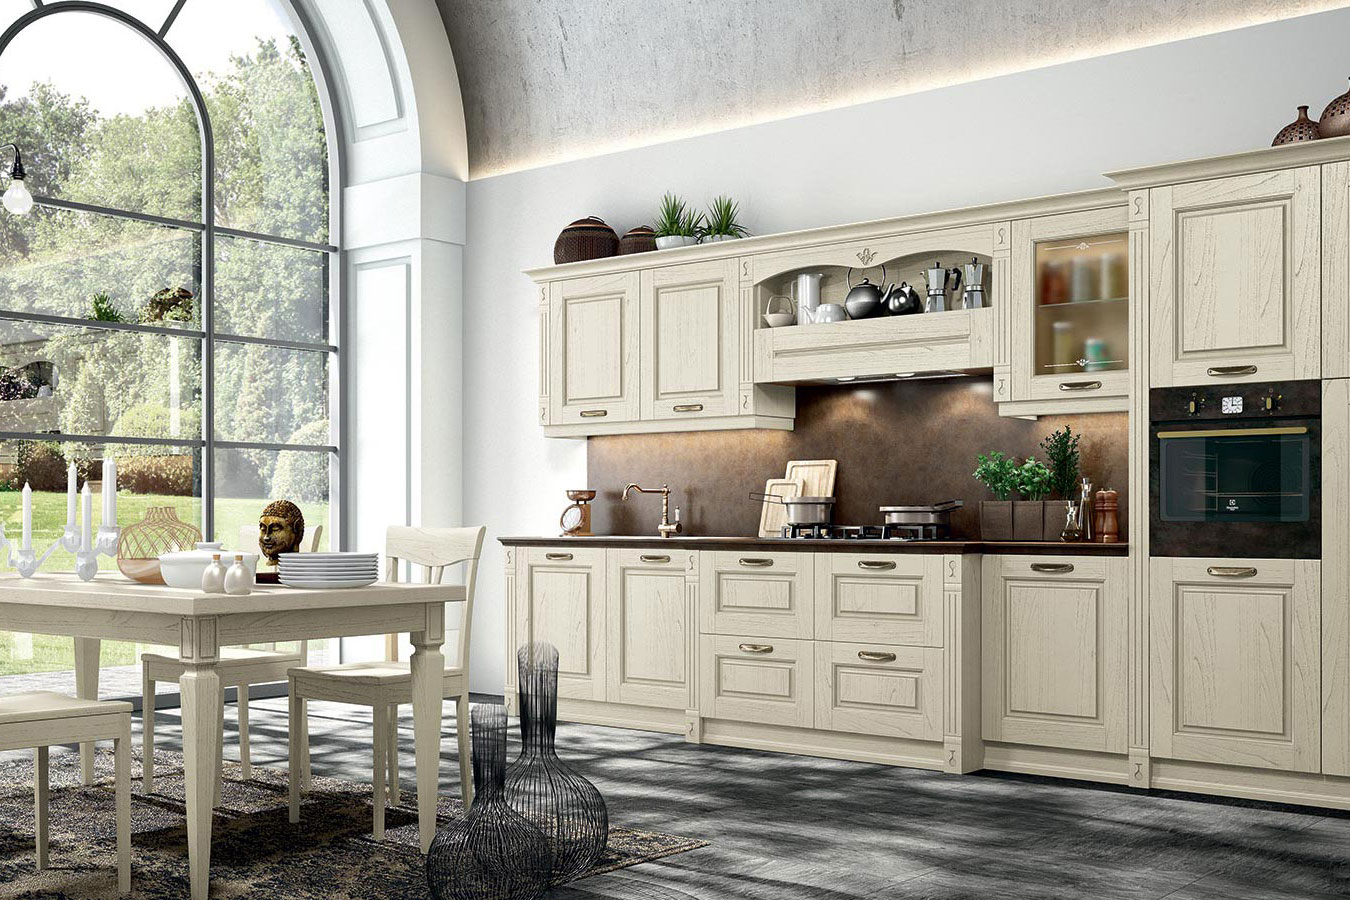 Cucina classica verona di arredo3 righetti mobili novara - Arredamento cucina classica ...